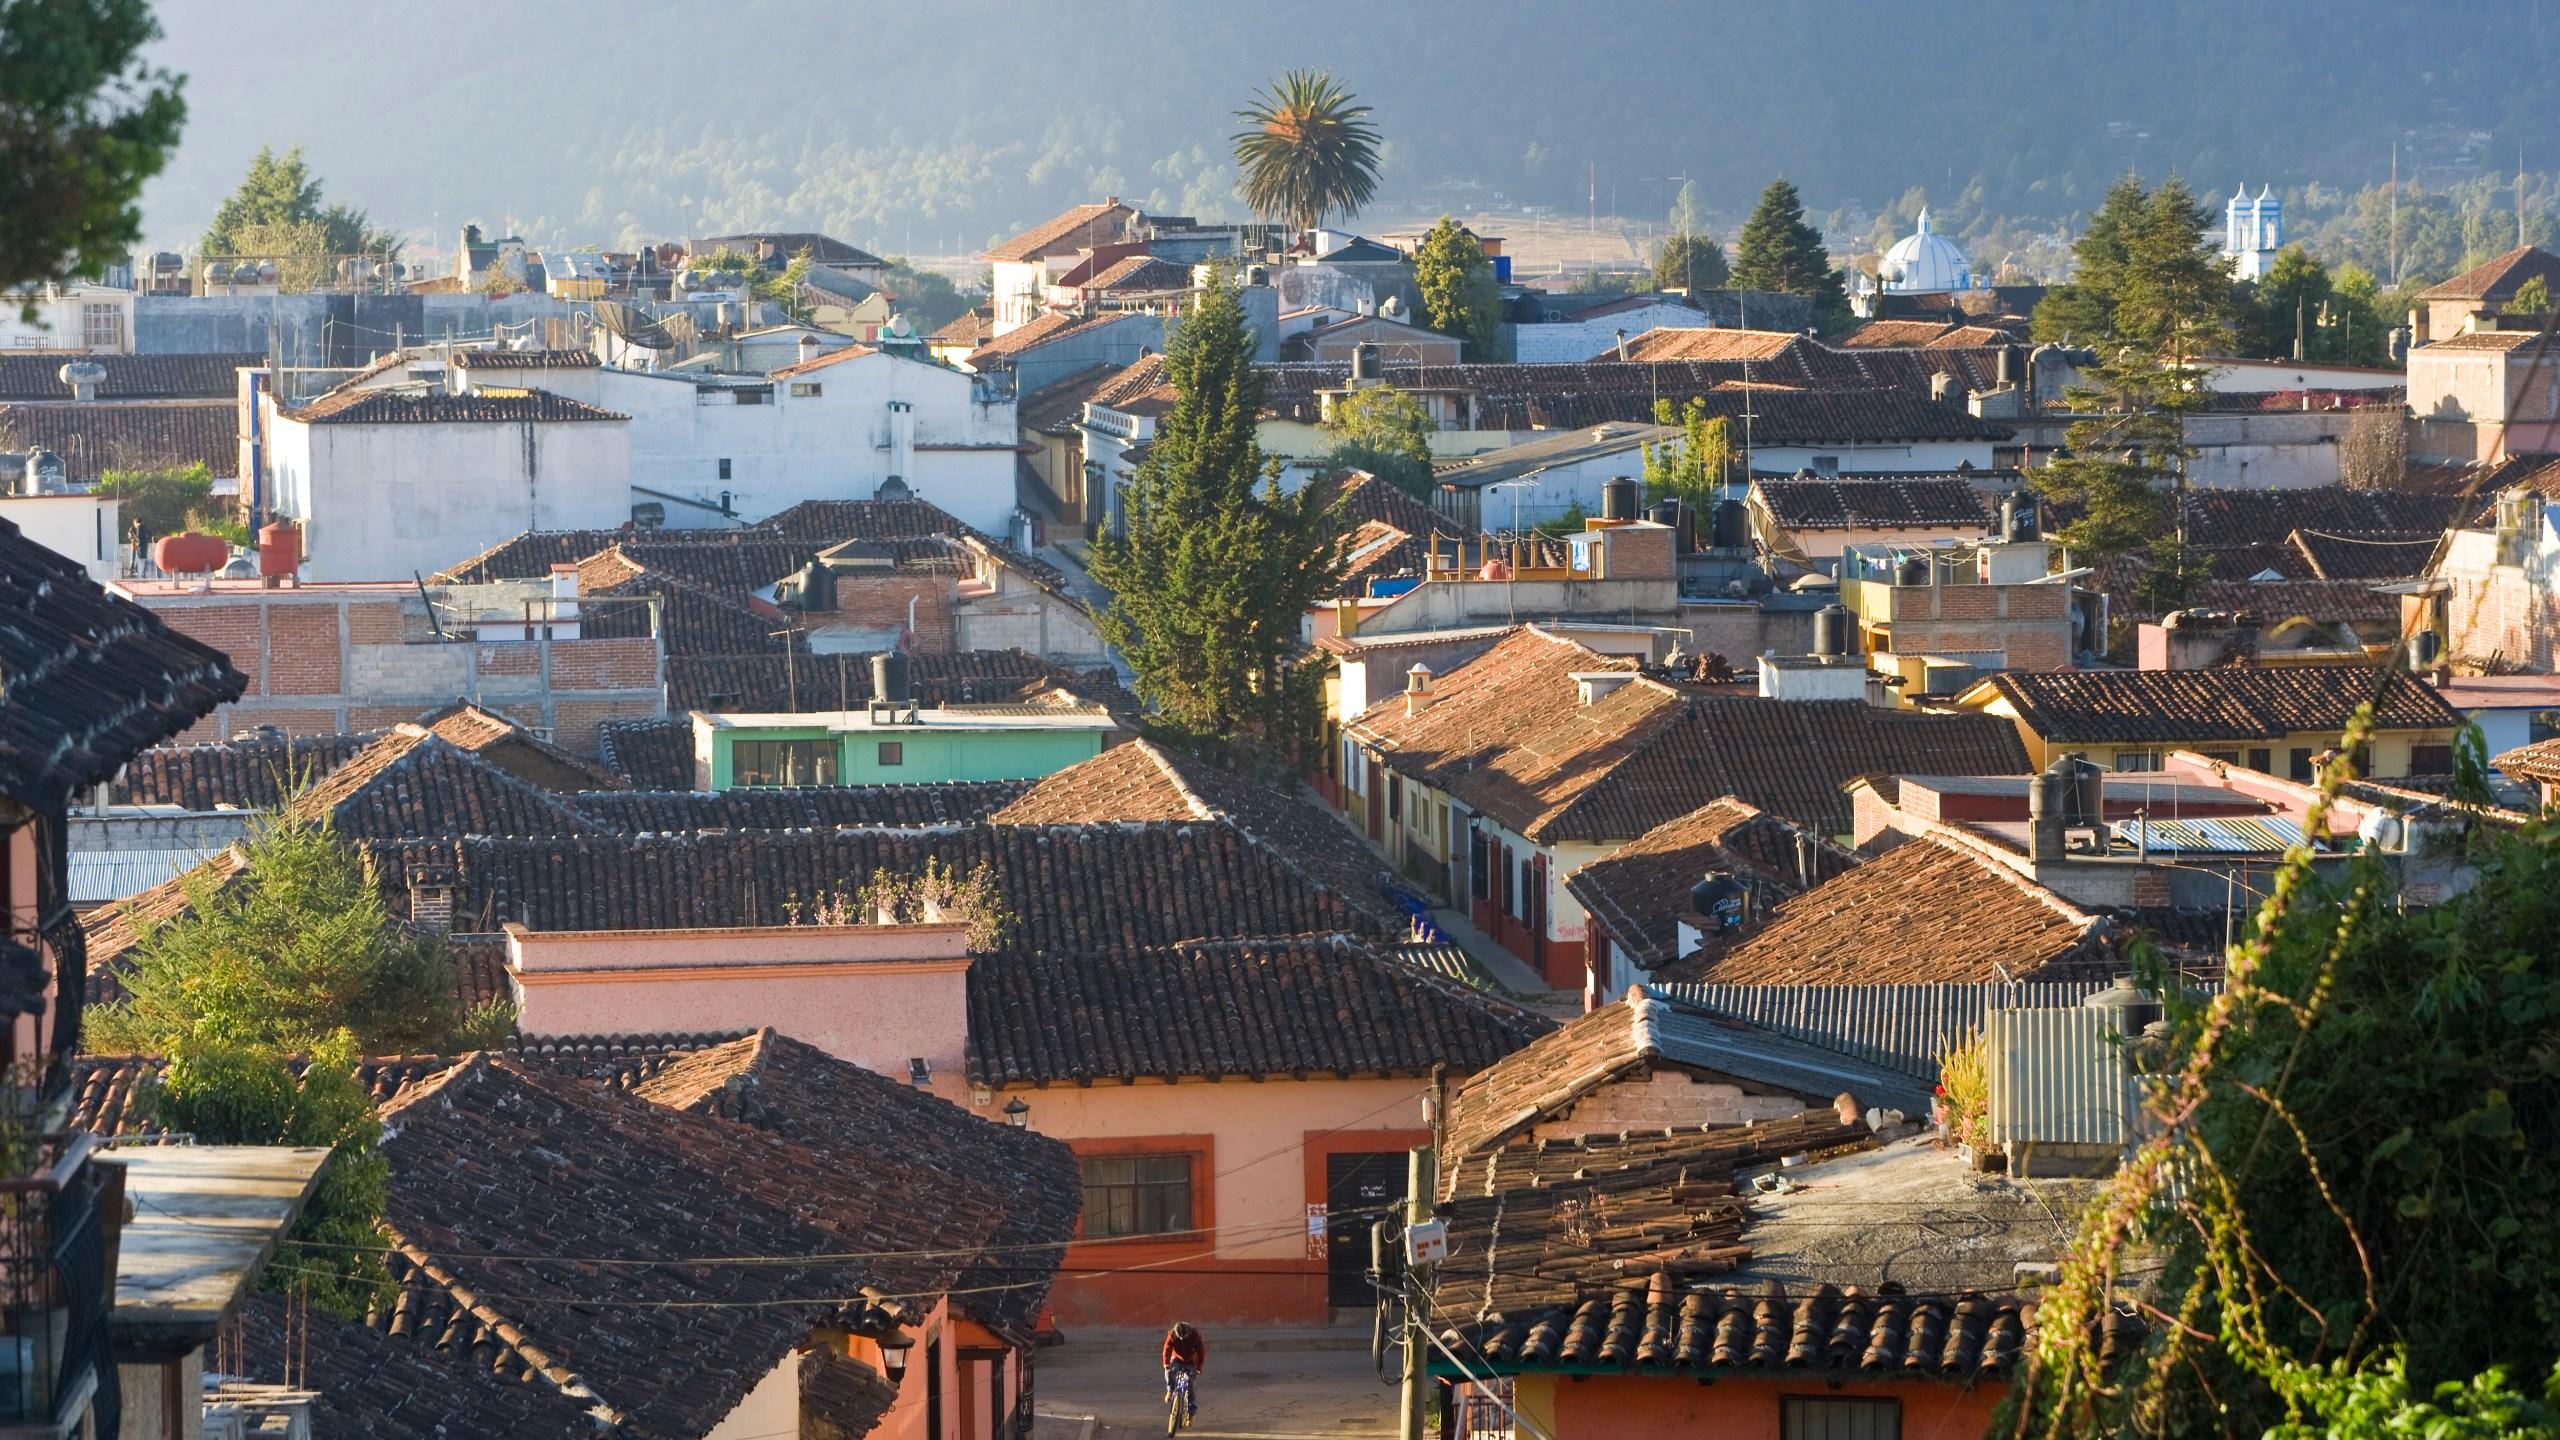 San Cristóbal de Las Casas, Chiapas State, Mexico, is seen in a file photo. (iStock / Getty /Images Plus)